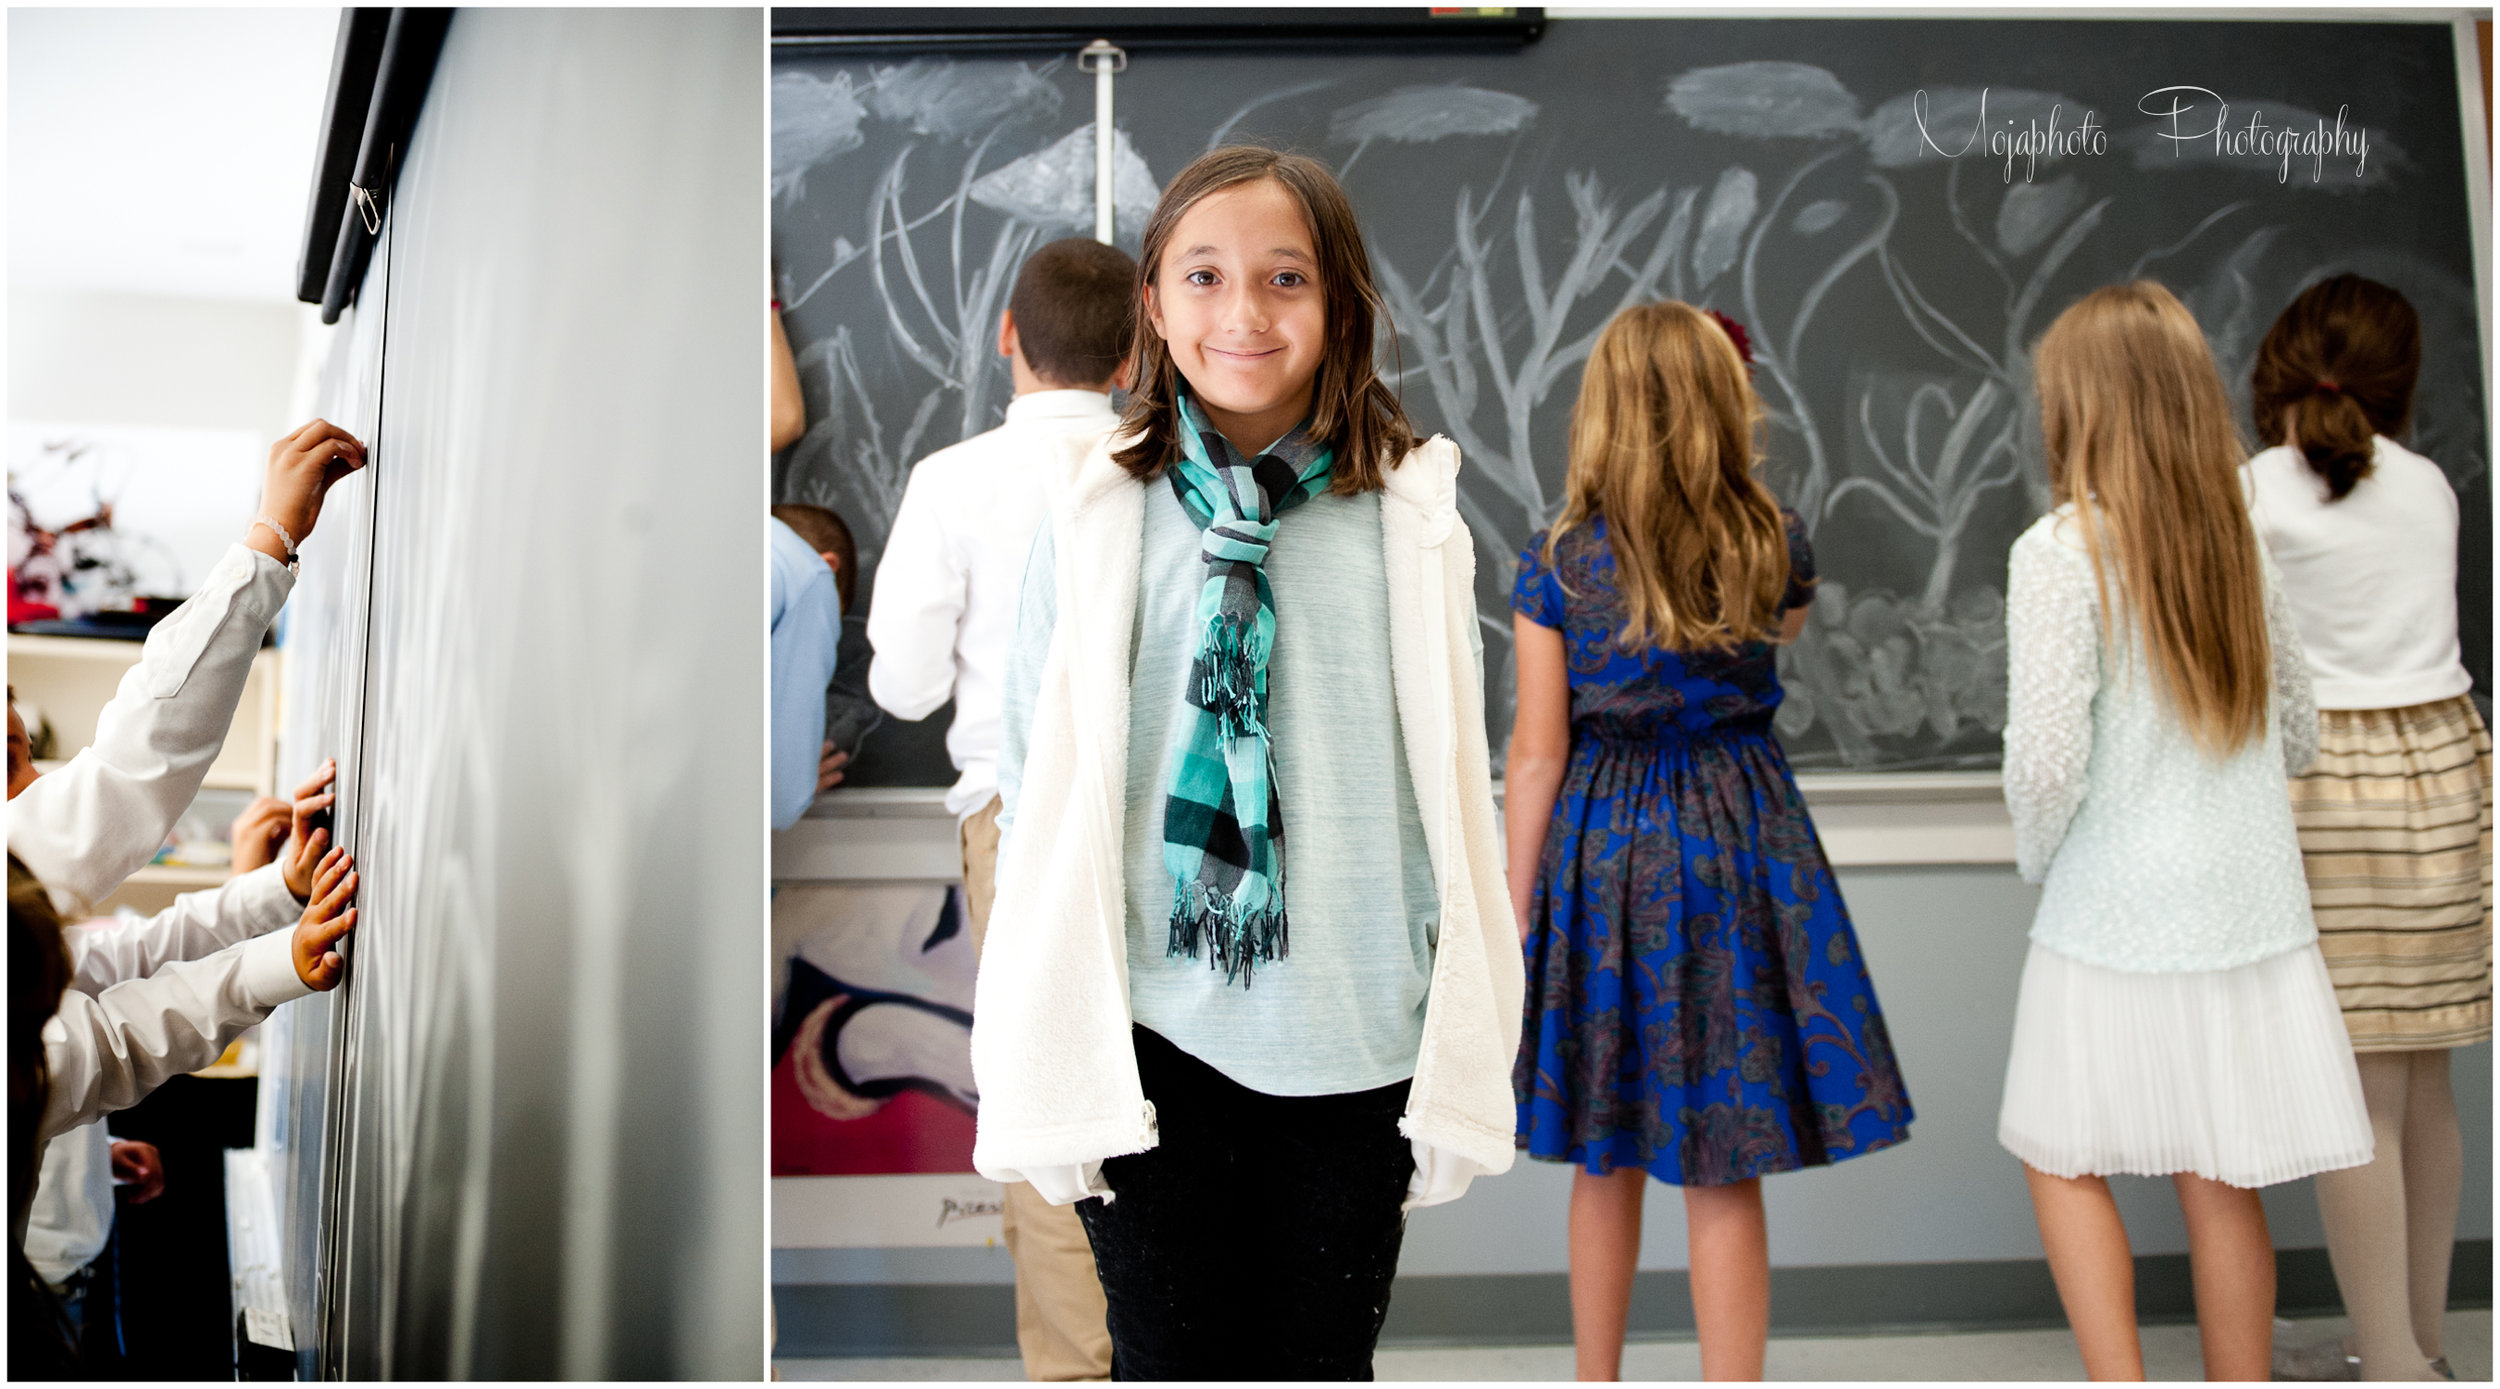 Ava in Art class 2015.jpg